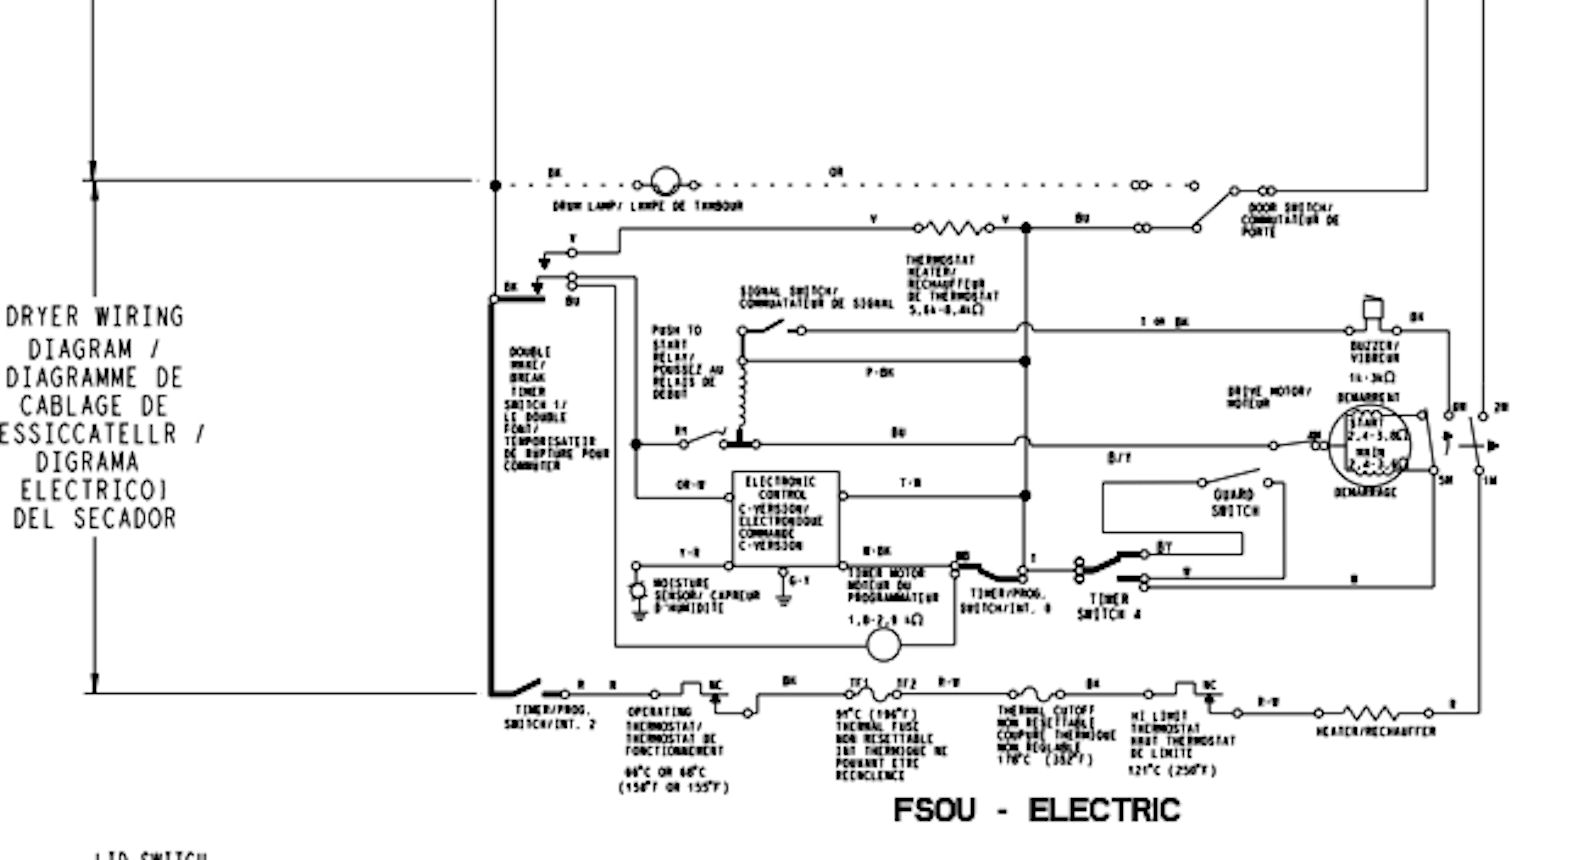 Maytag Dryer Model Pye3300ayw Wiring Schematics Diagram It Is About